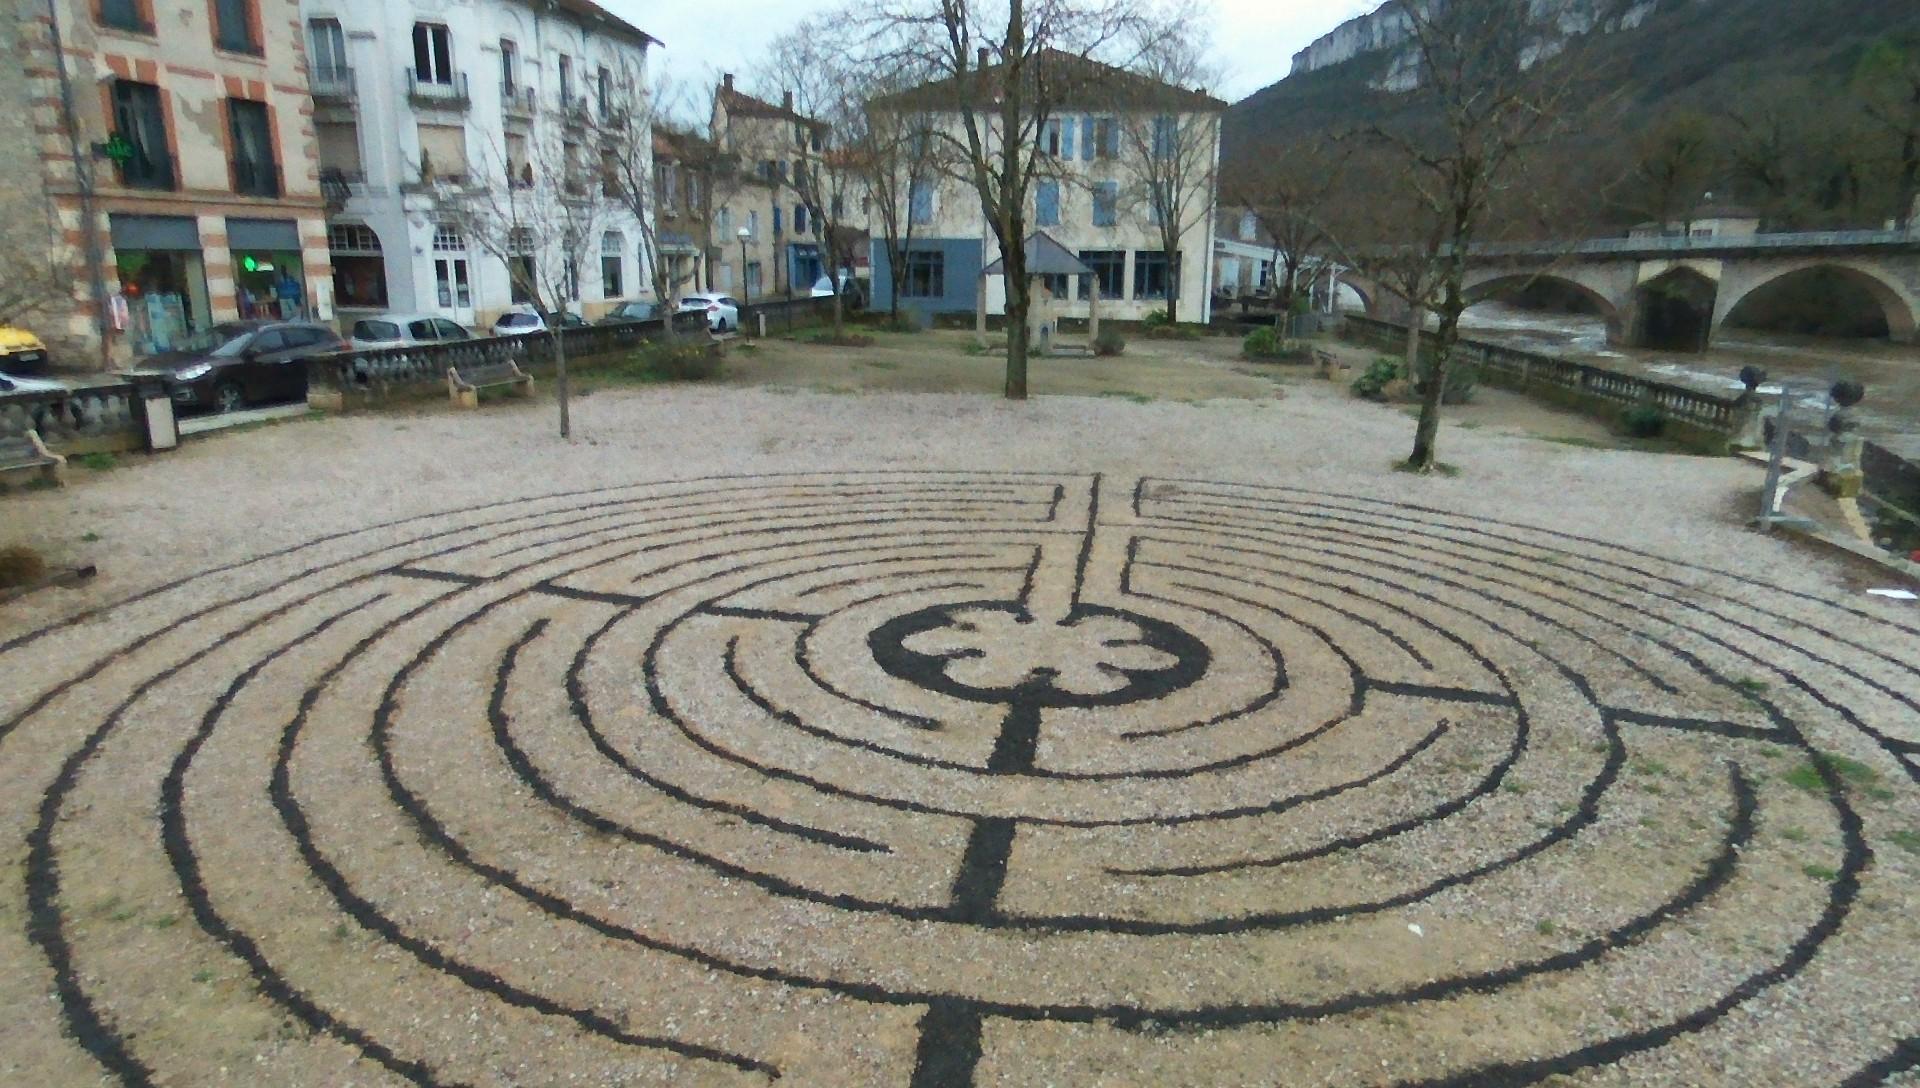 St. Antonin France Labyrinth